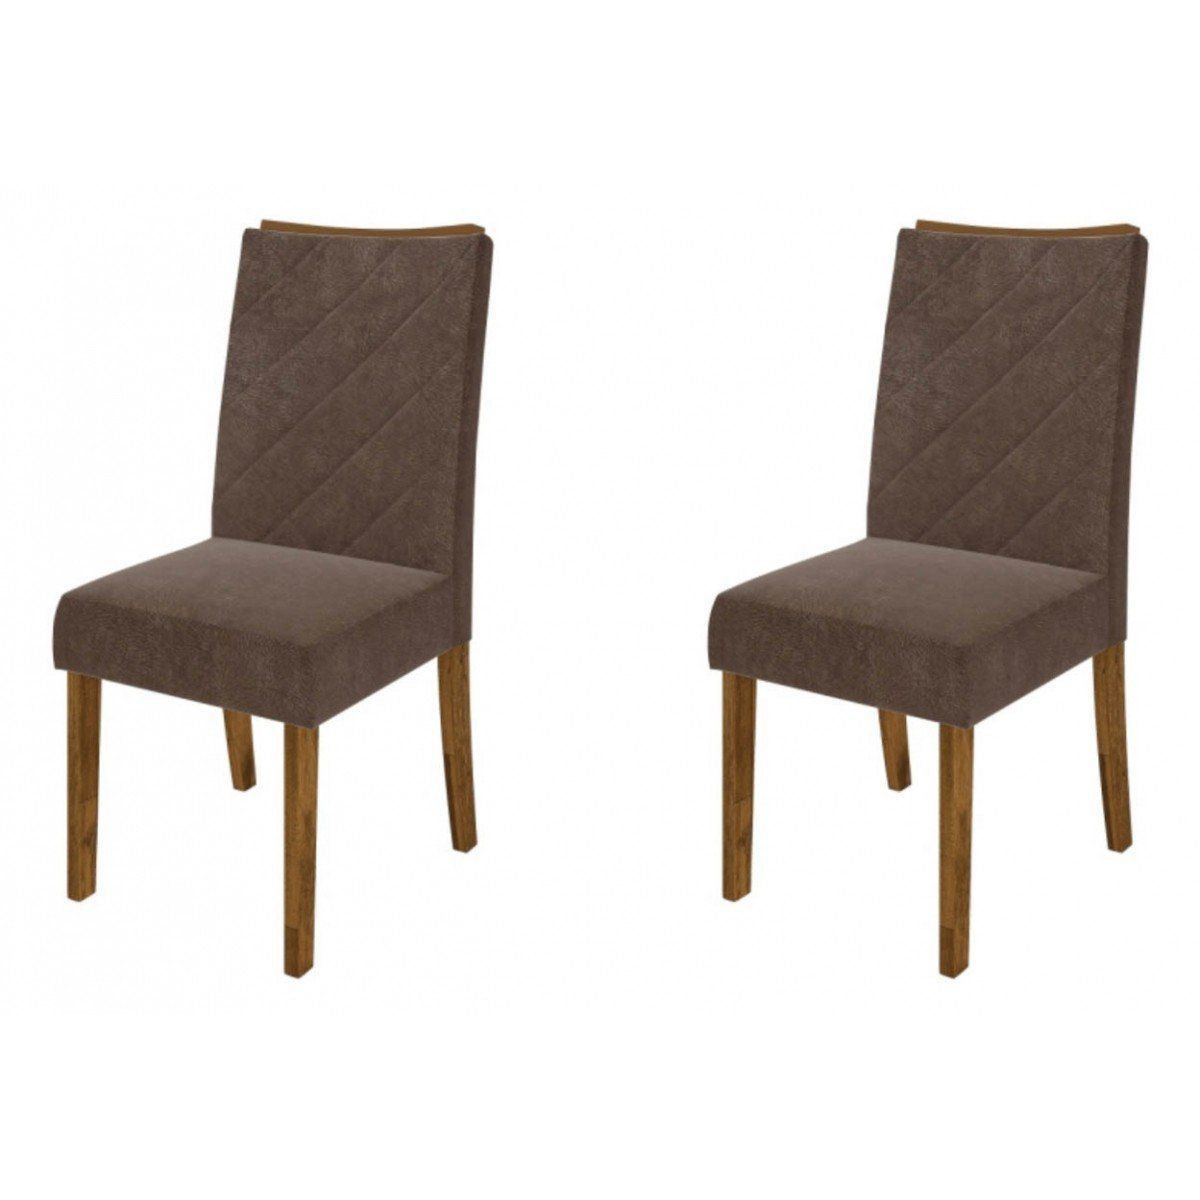 Kit 2 Cadeiras Golden para Sala de Jantar Demolição - DJ Móveis